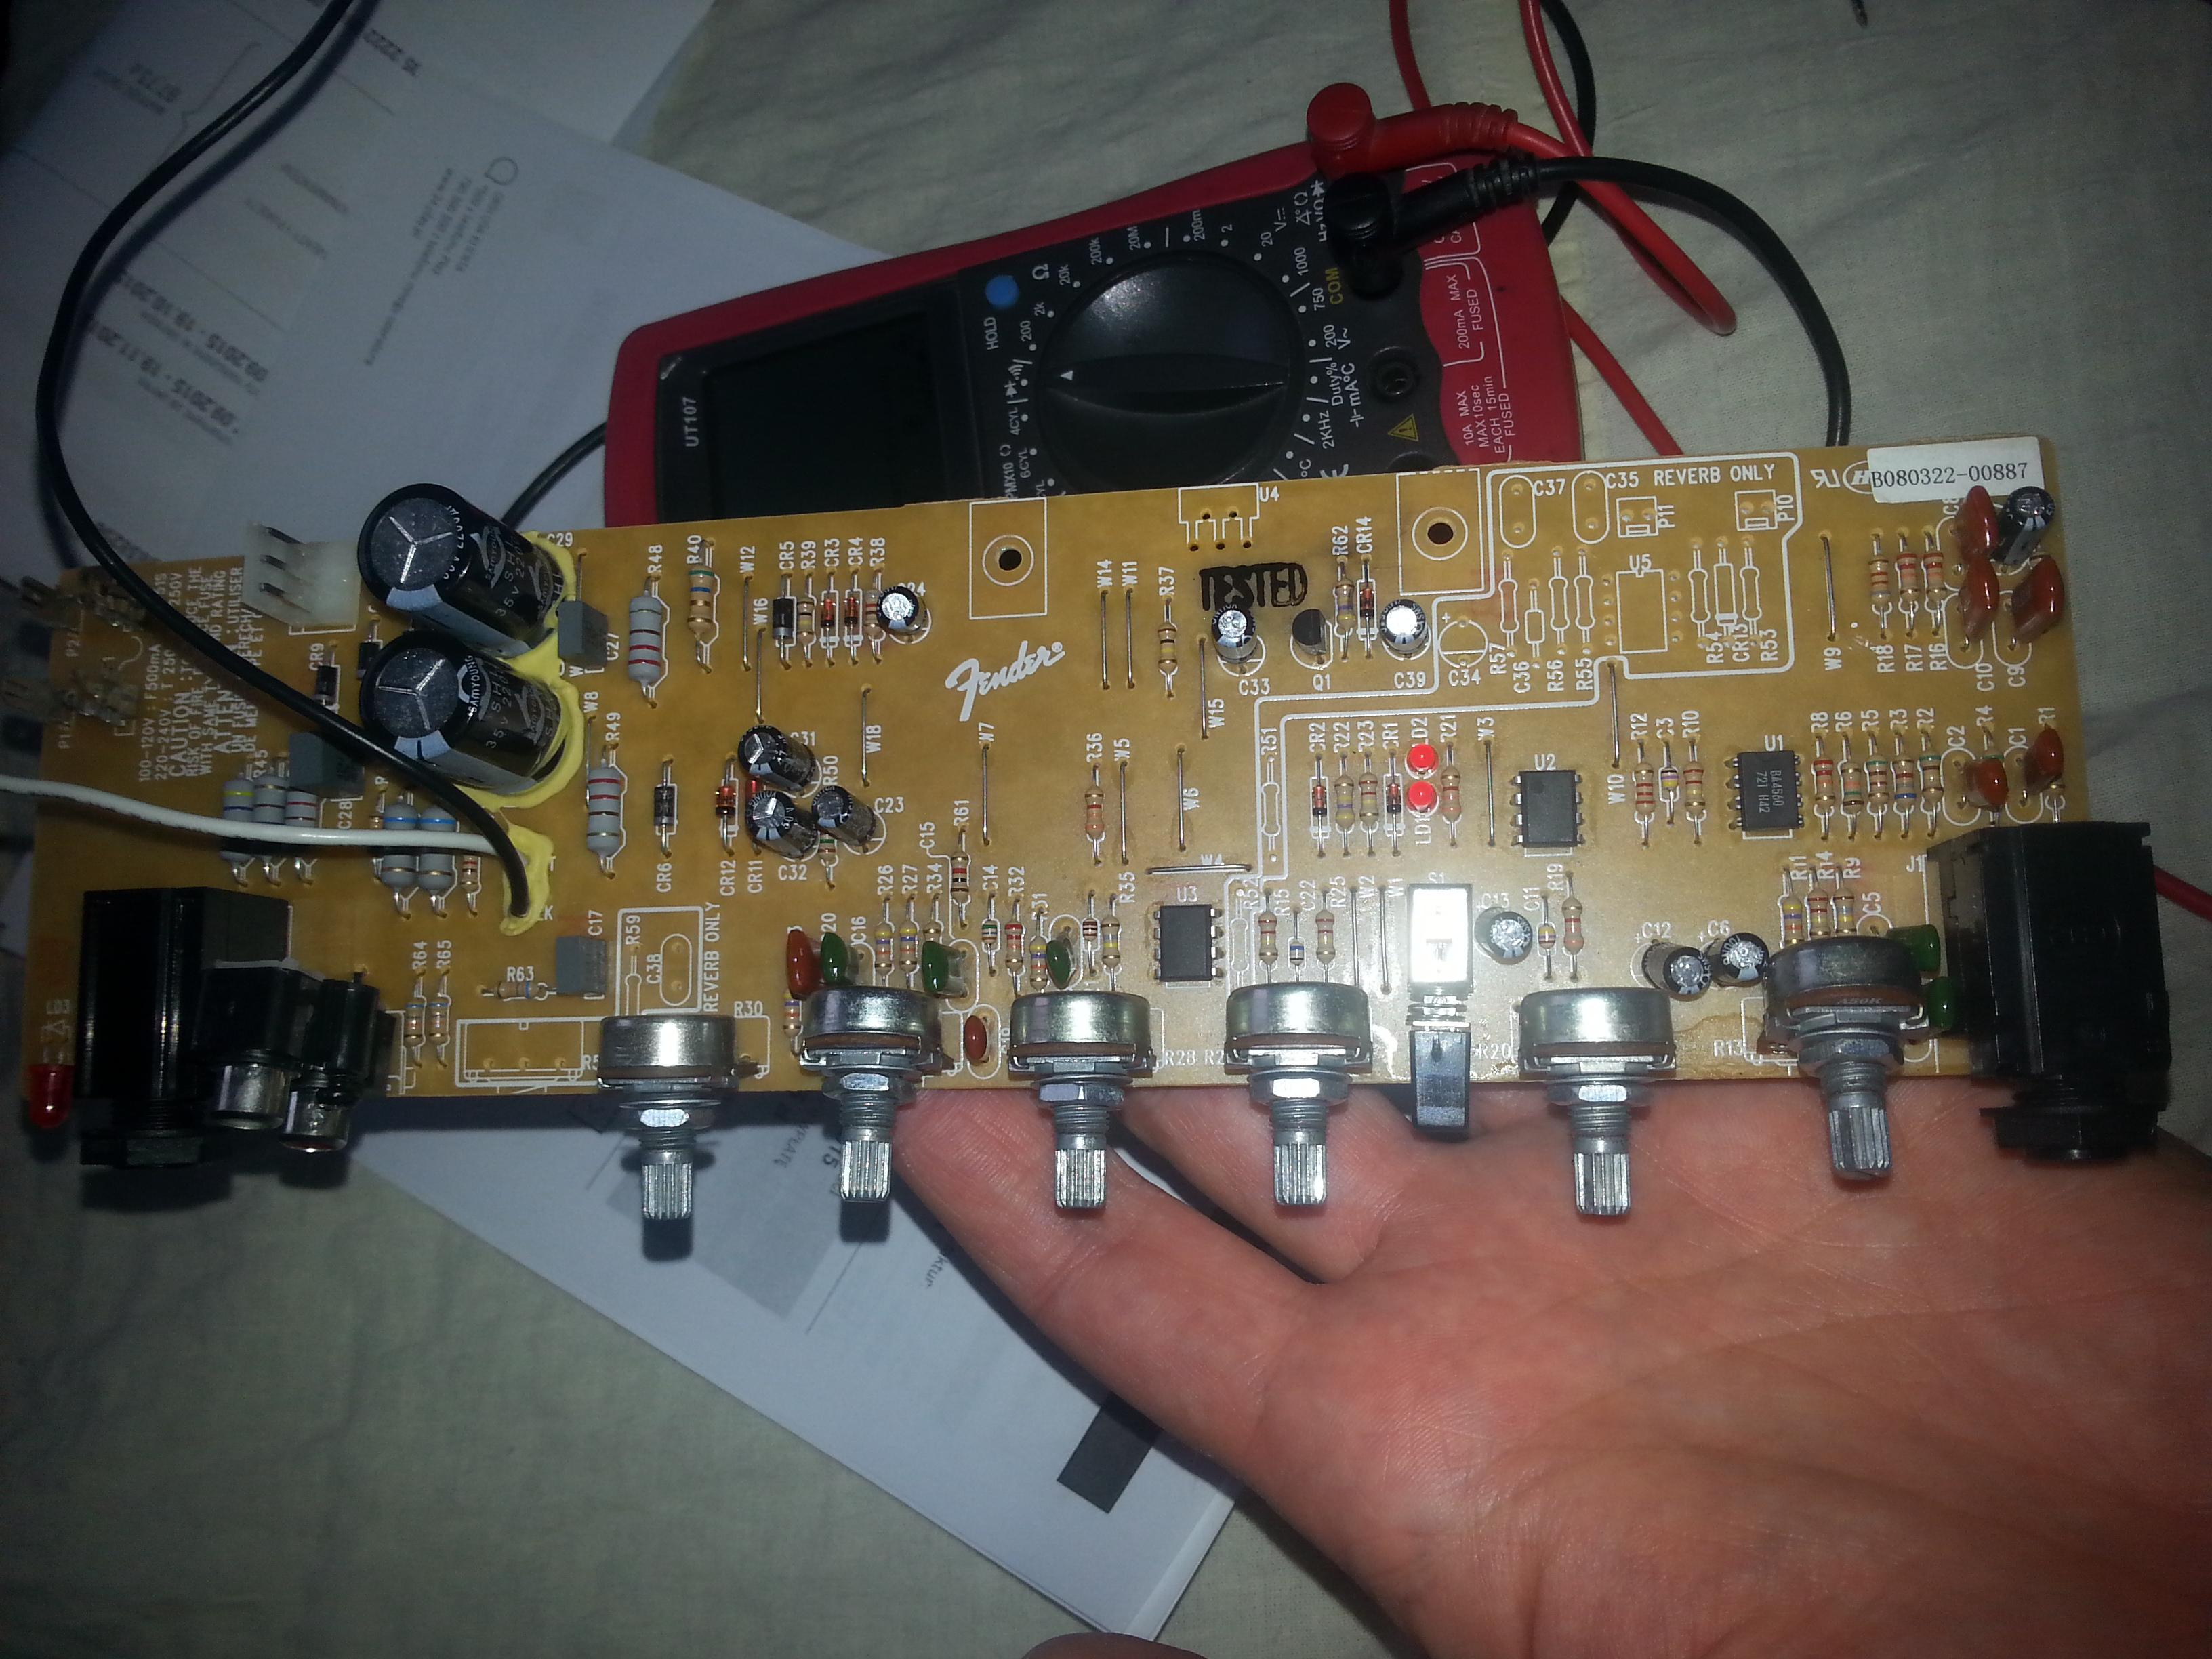 Fender Frontman 15G - Pali bezpiecznik - naprawa. - elektroda.pl on